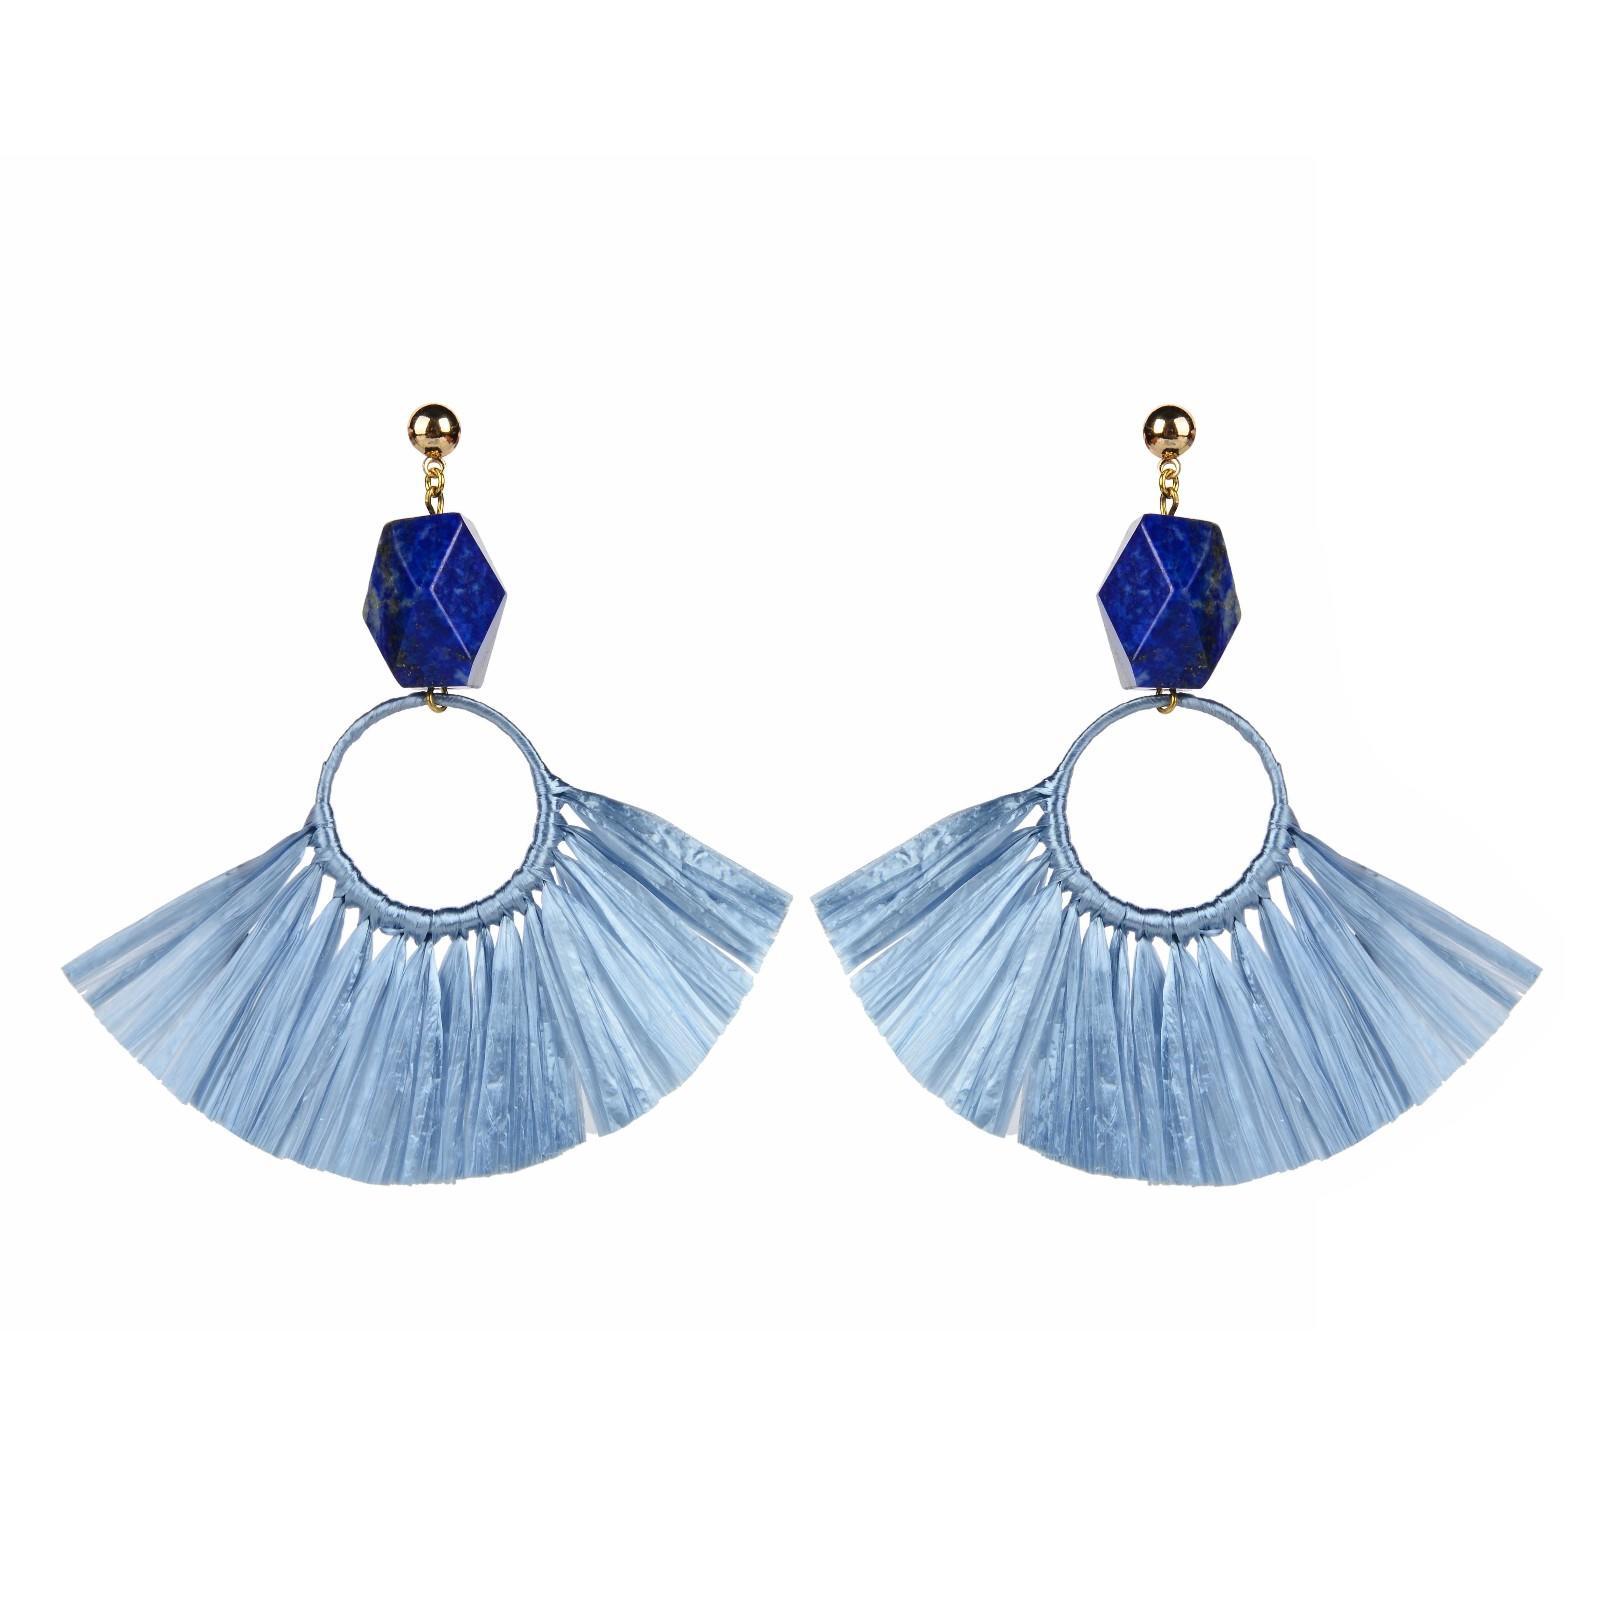 Custom statement boho boho earrings TTT Jewelry handmade